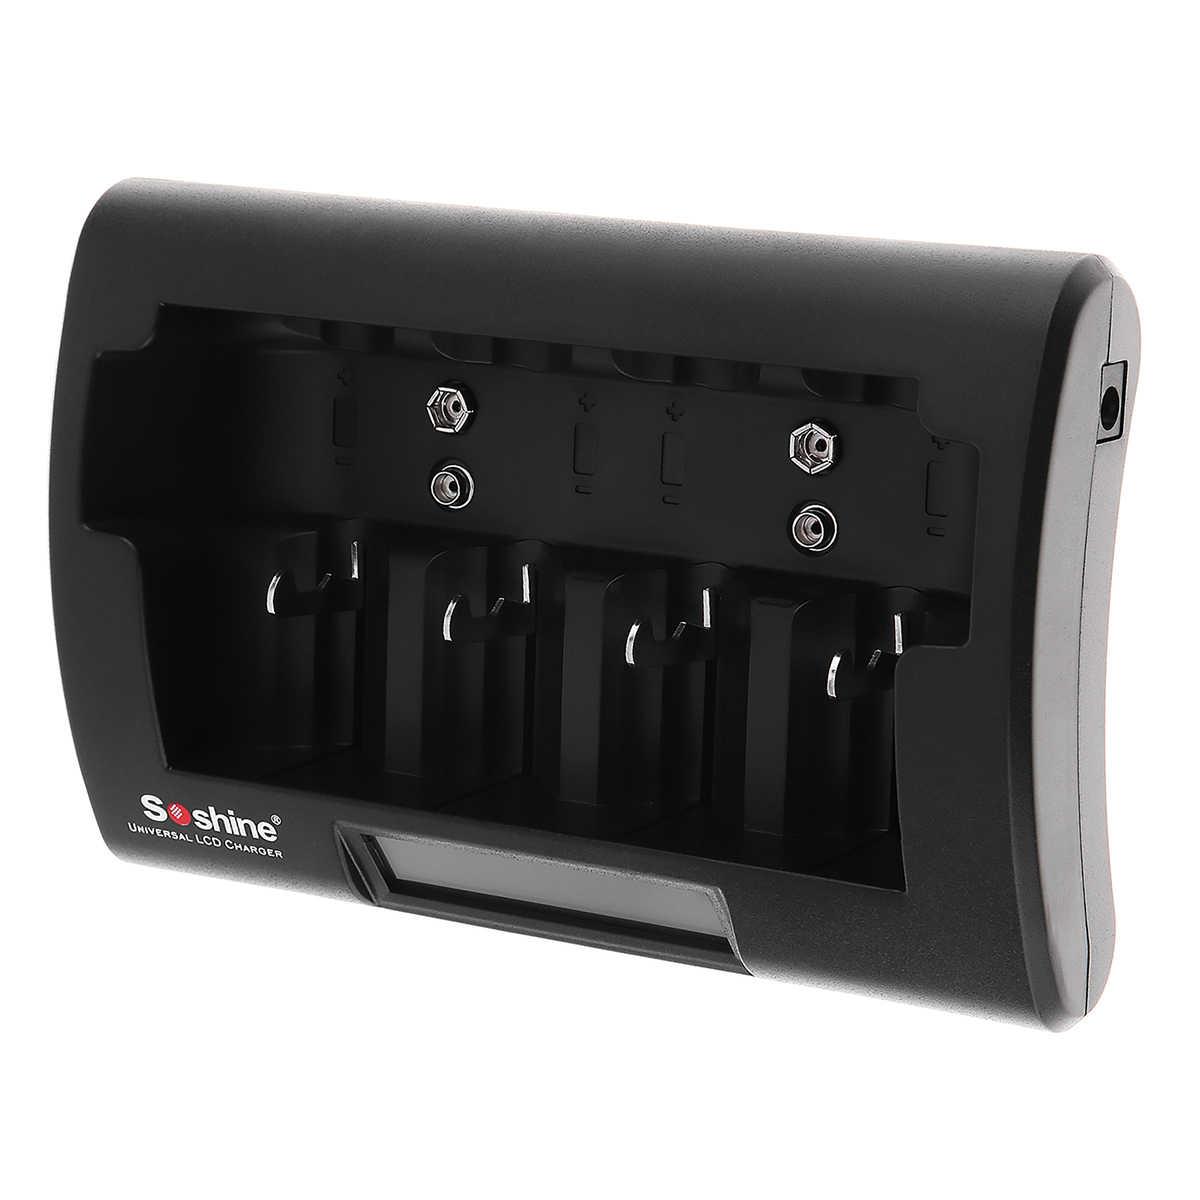 Soshine لوحة تحكم شاملة في التلفزيون الإل سي دي عرض شاحن بطارية 12-18 فولت تيار مستمر ل Ni-mh/Ni-Cd/AA/AAA/9 فولت/D البطارية مع الاتحاد الأوروبي/الولايات المتحدة التوصيل